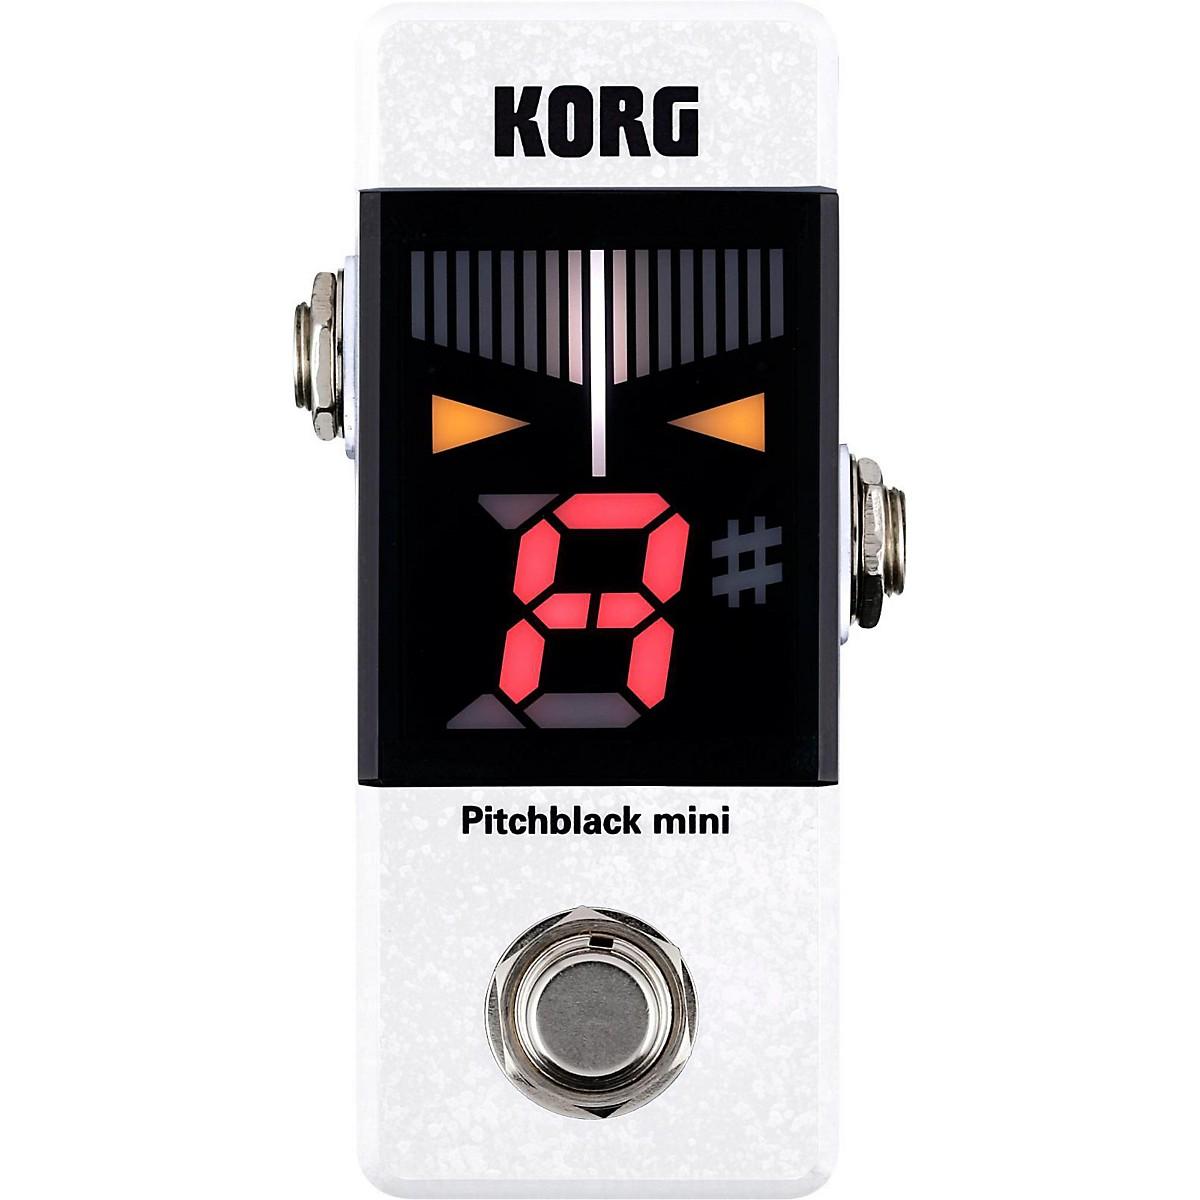 Korg Pitchblack Mini Limited Edition Pedal Tuner